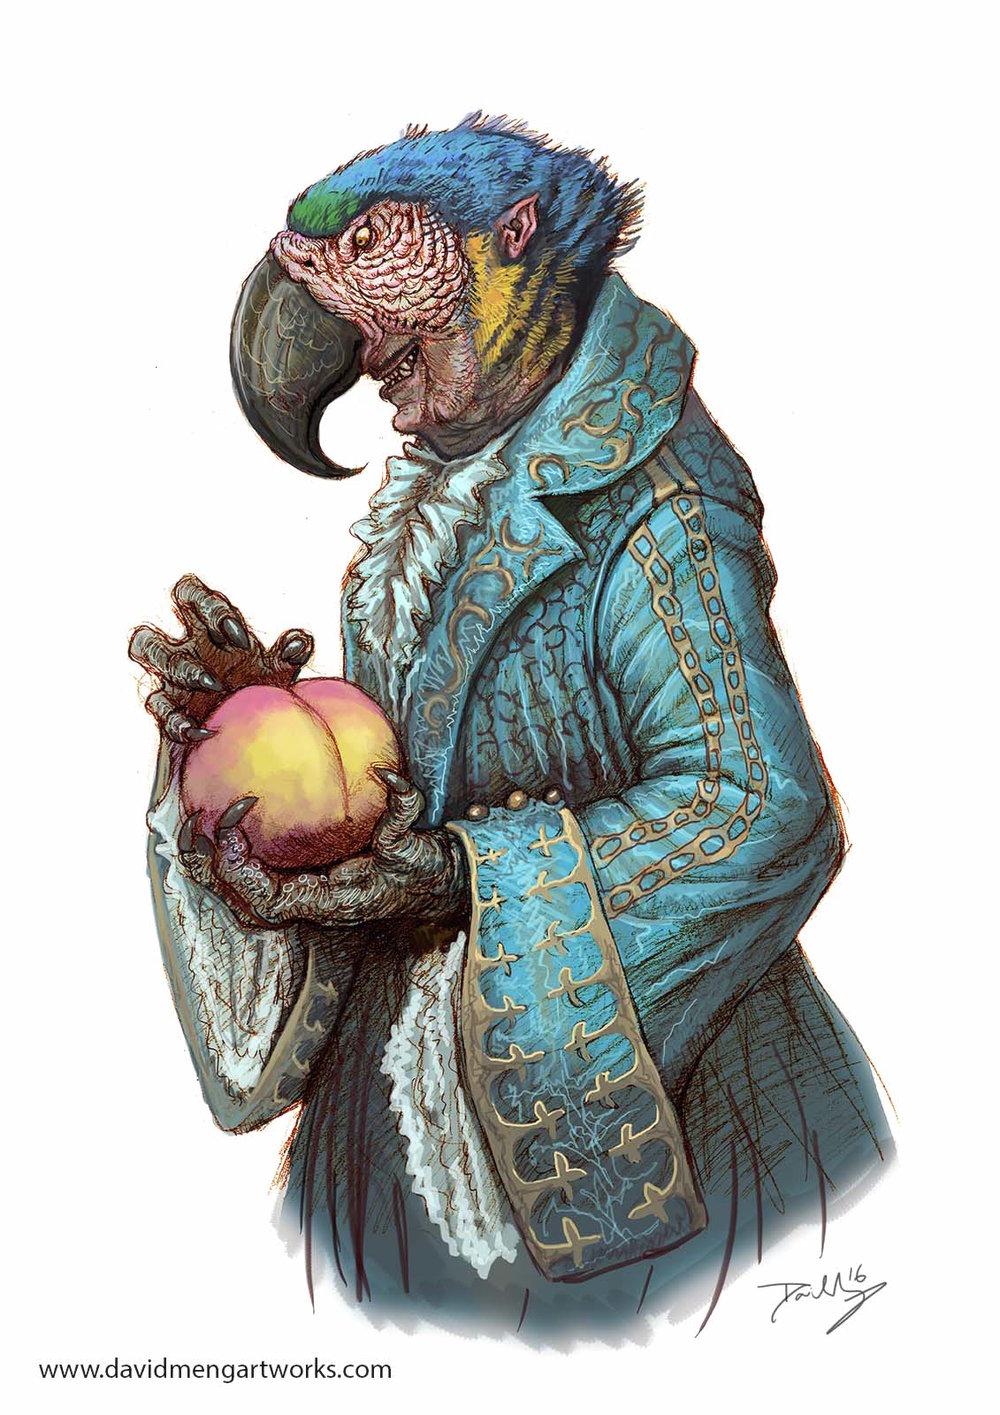 Parrot Goblin